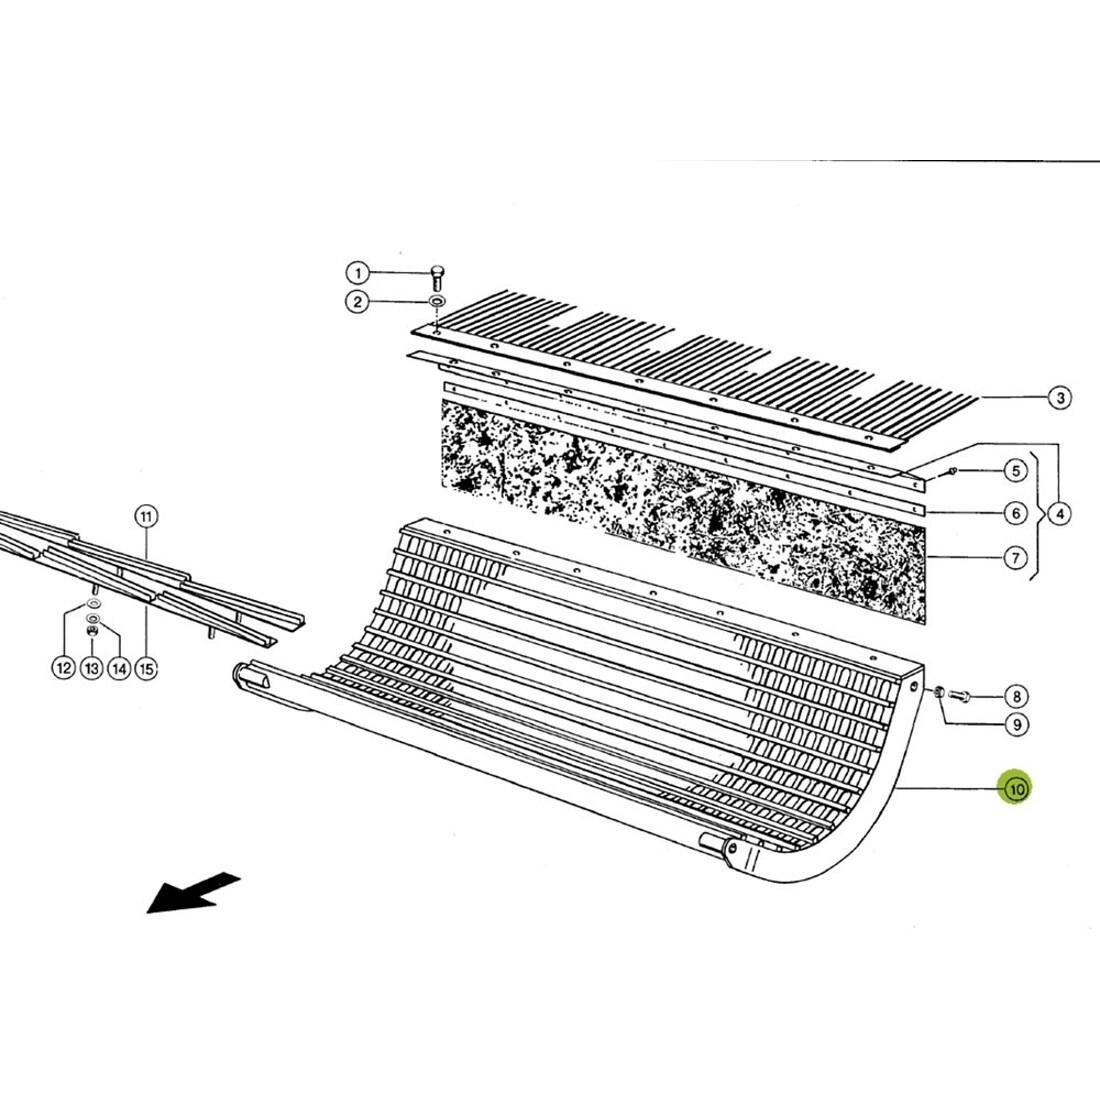 Combine Parts Claas Threshing Main Concave 20x40. OEM# 6633471